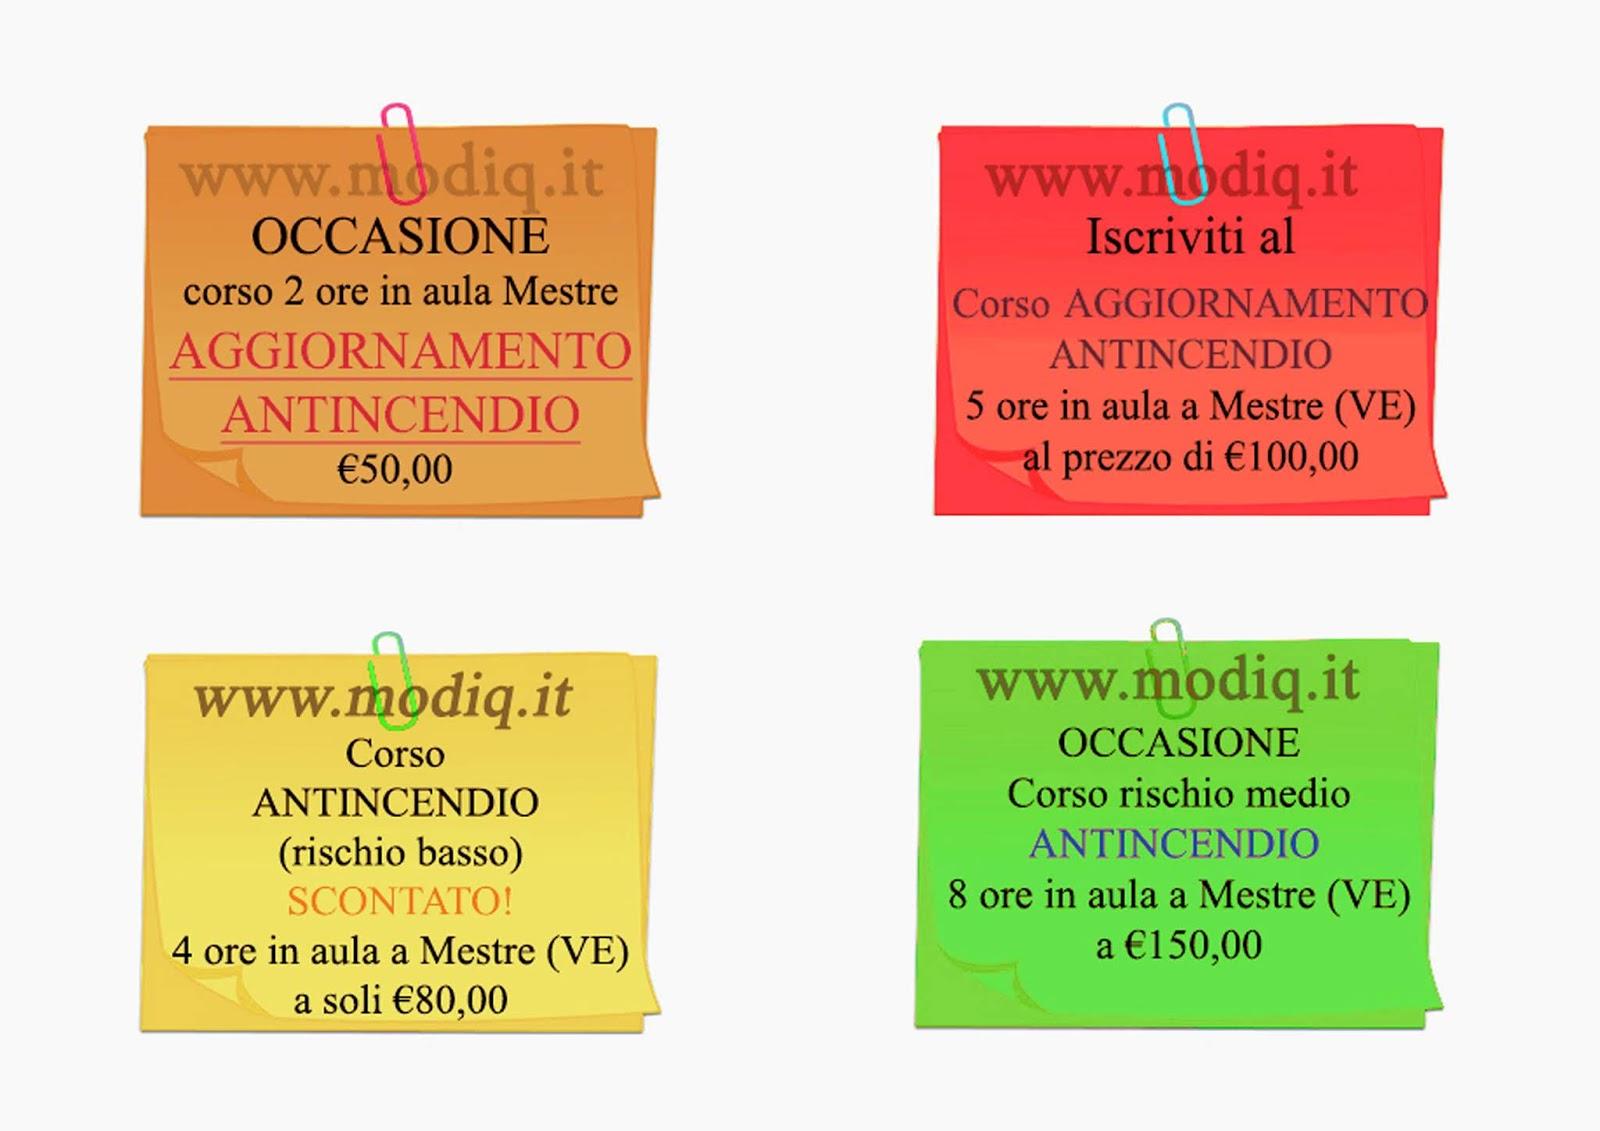 Asiatico Dating sito web 100 gratis